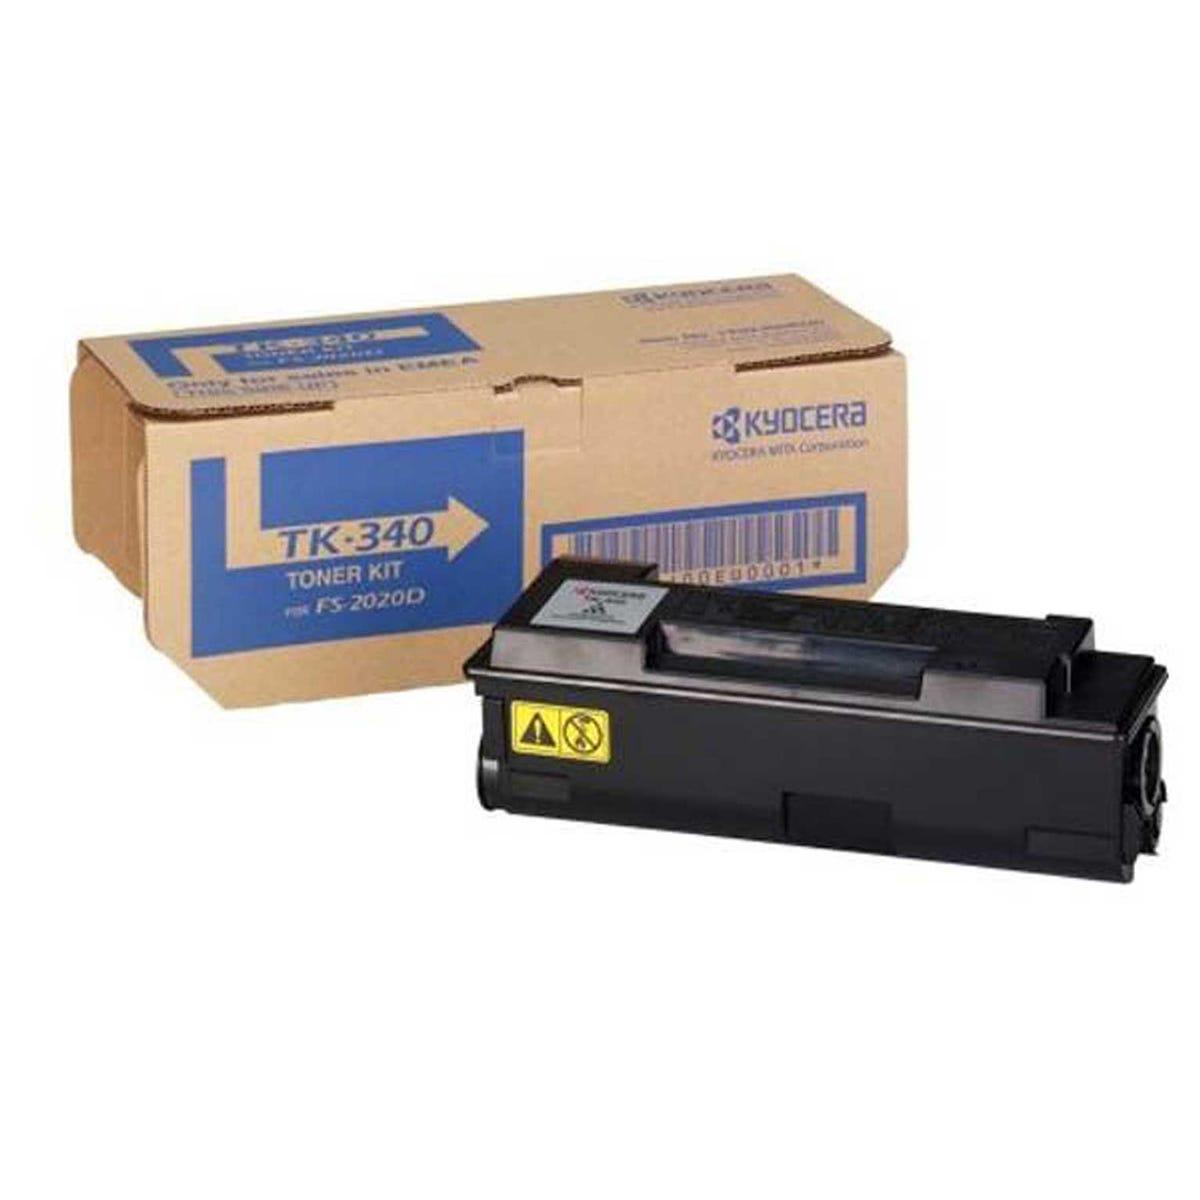 Image of Kyocera TK-340 Printer Toner Cartridge Kit, Black